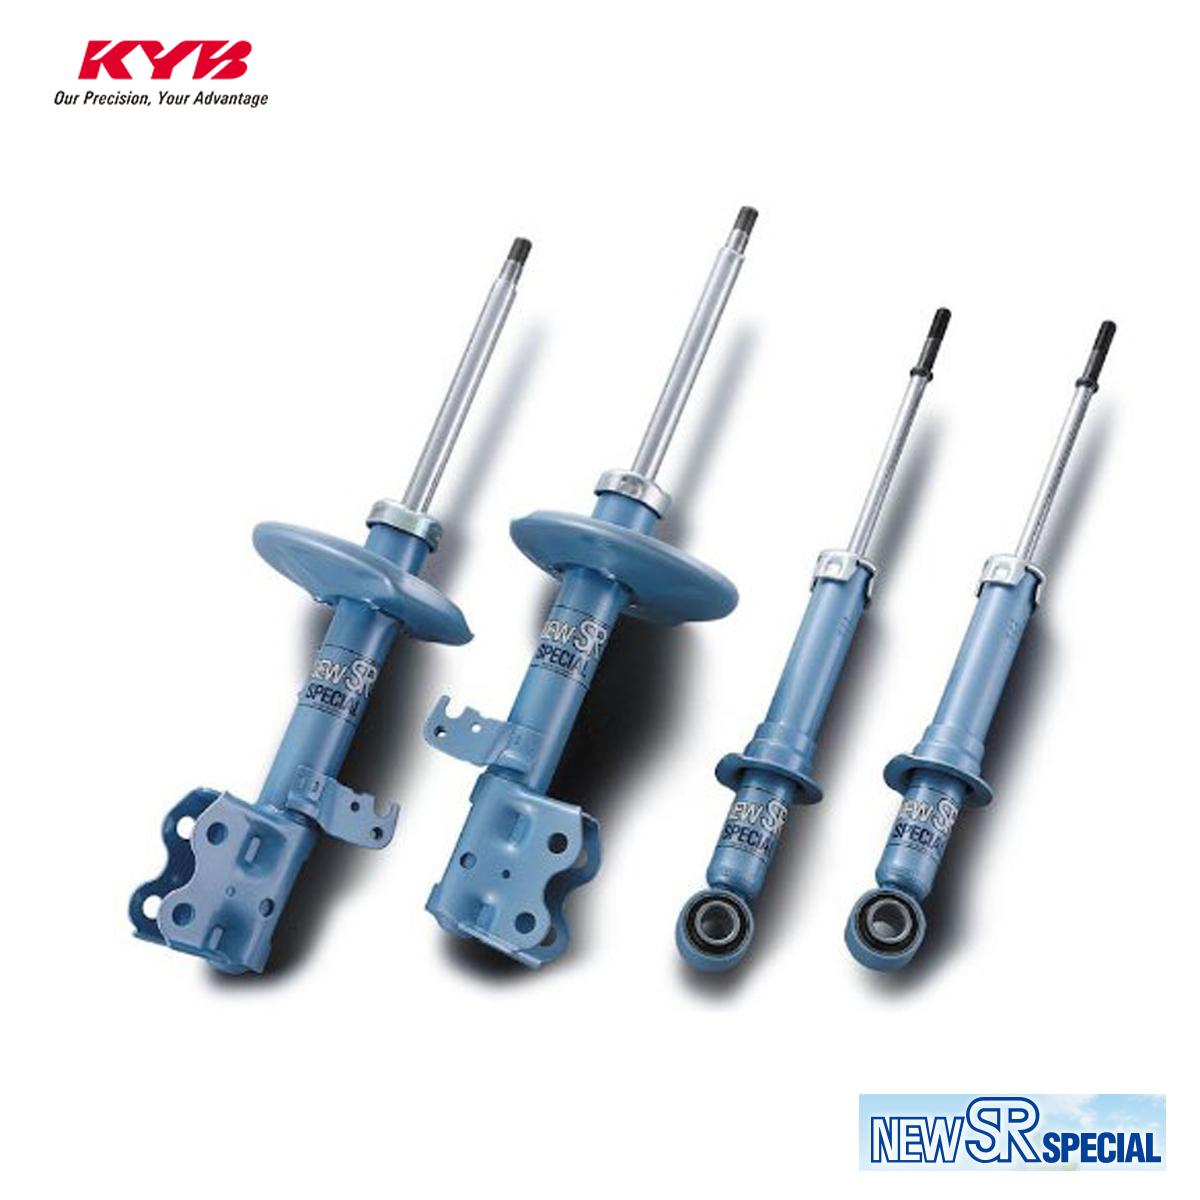 KYB カヤバ ハイエース レジアスエース TRH228B/KDH227B ショックアブソーバー 1台分 NEW SR SPECIAL NS-20842085 配送先条件有り